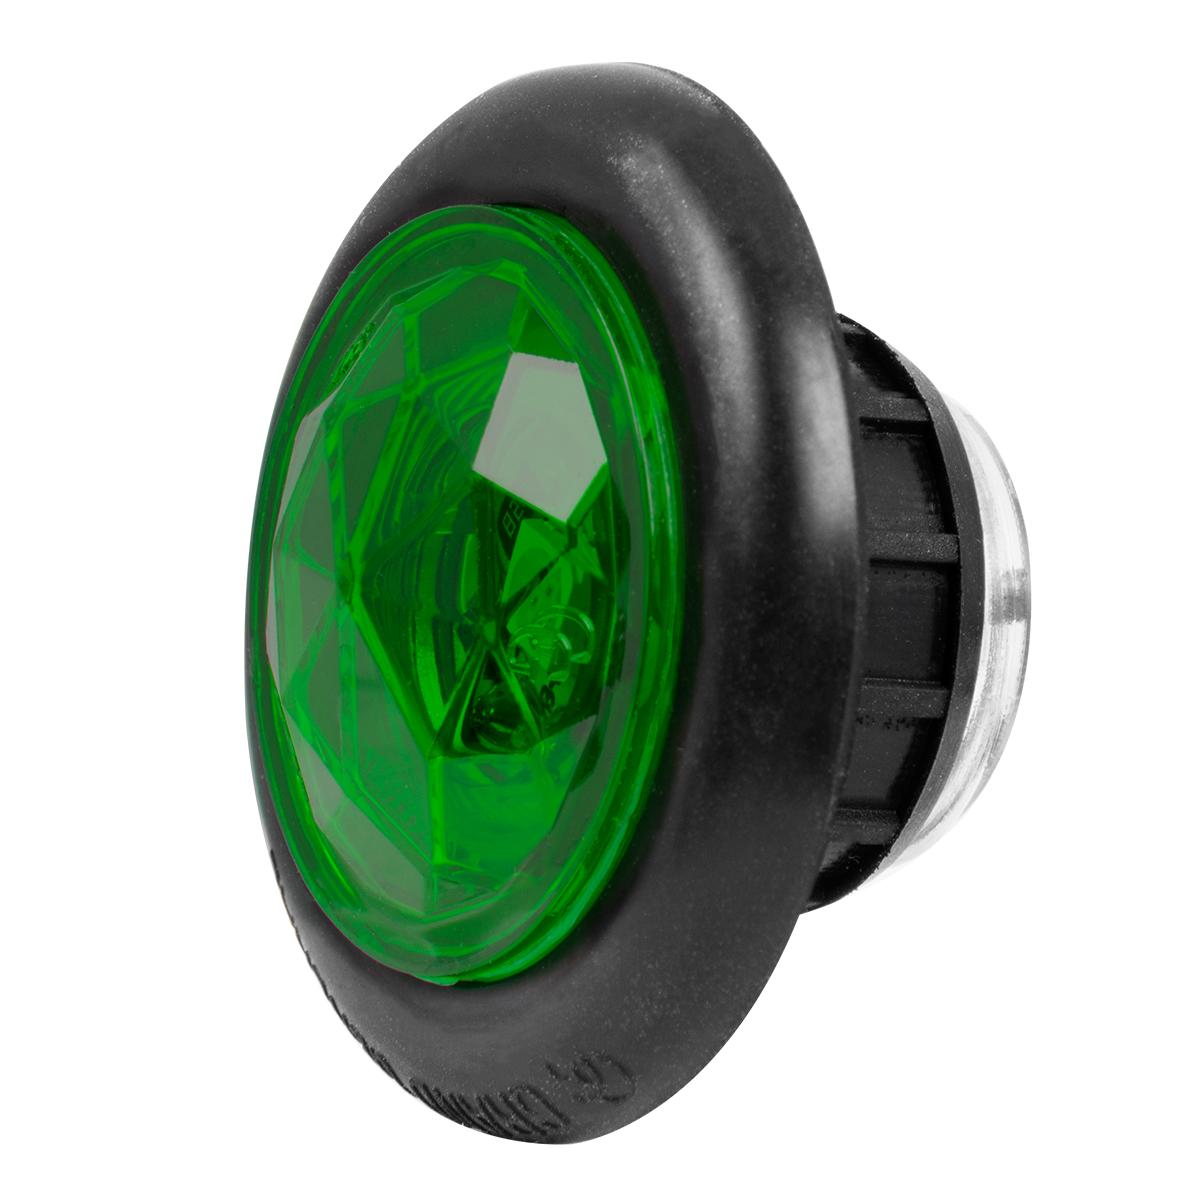 "1"" Dia. Dual Function Diamond Lens LED Light with Rubber Grommet"